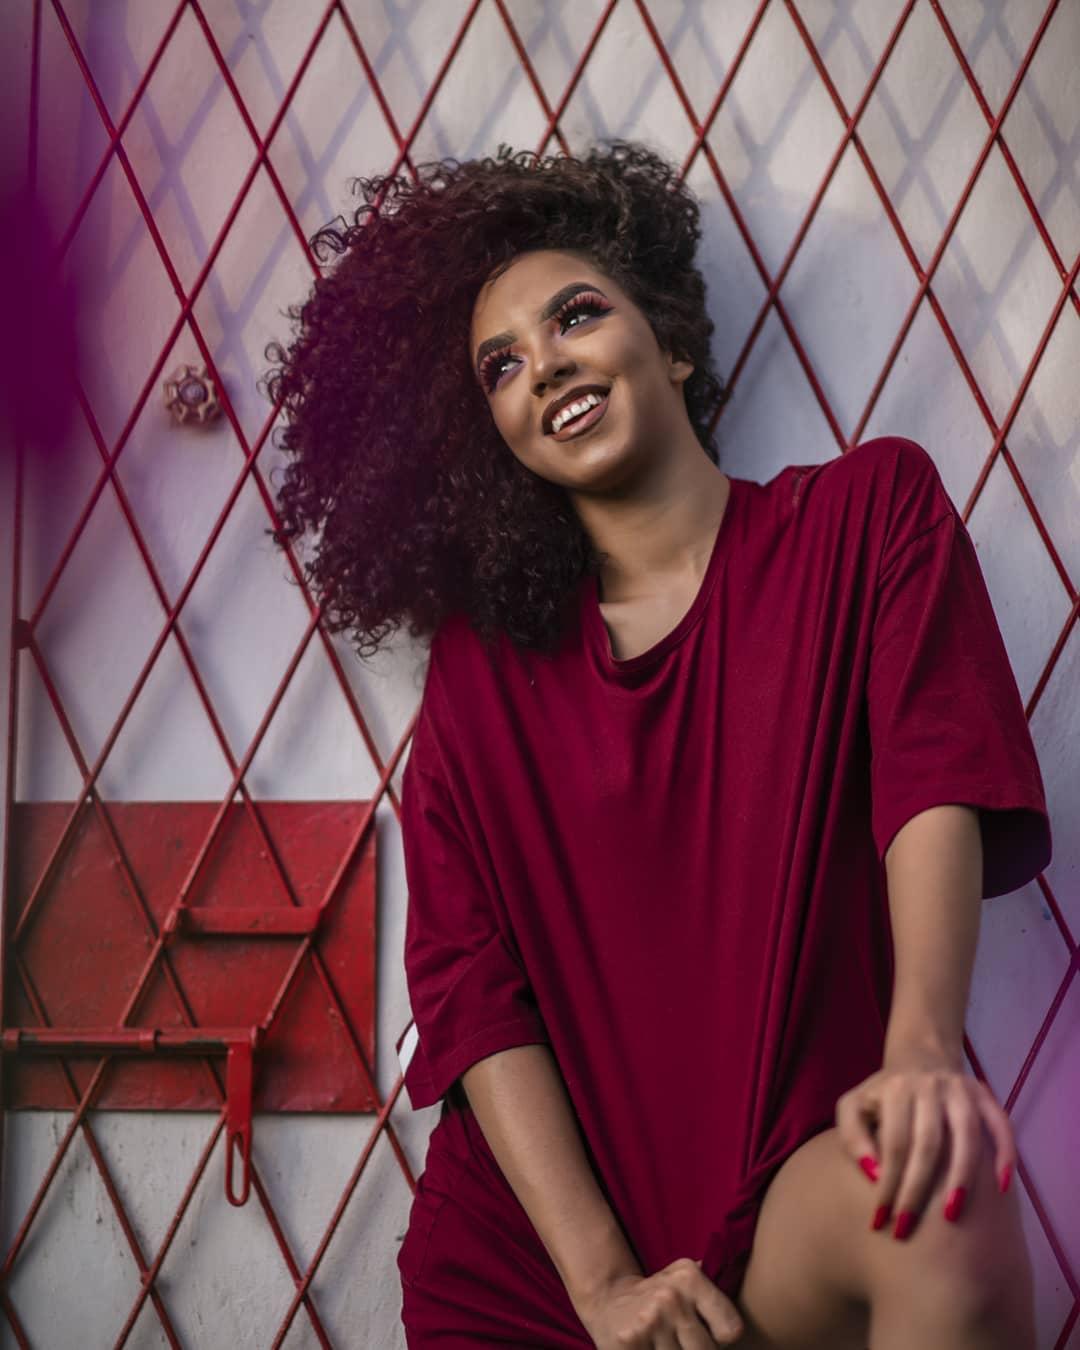 barbara sousa, miss brasil next generation 2019. - Página 3 53830410